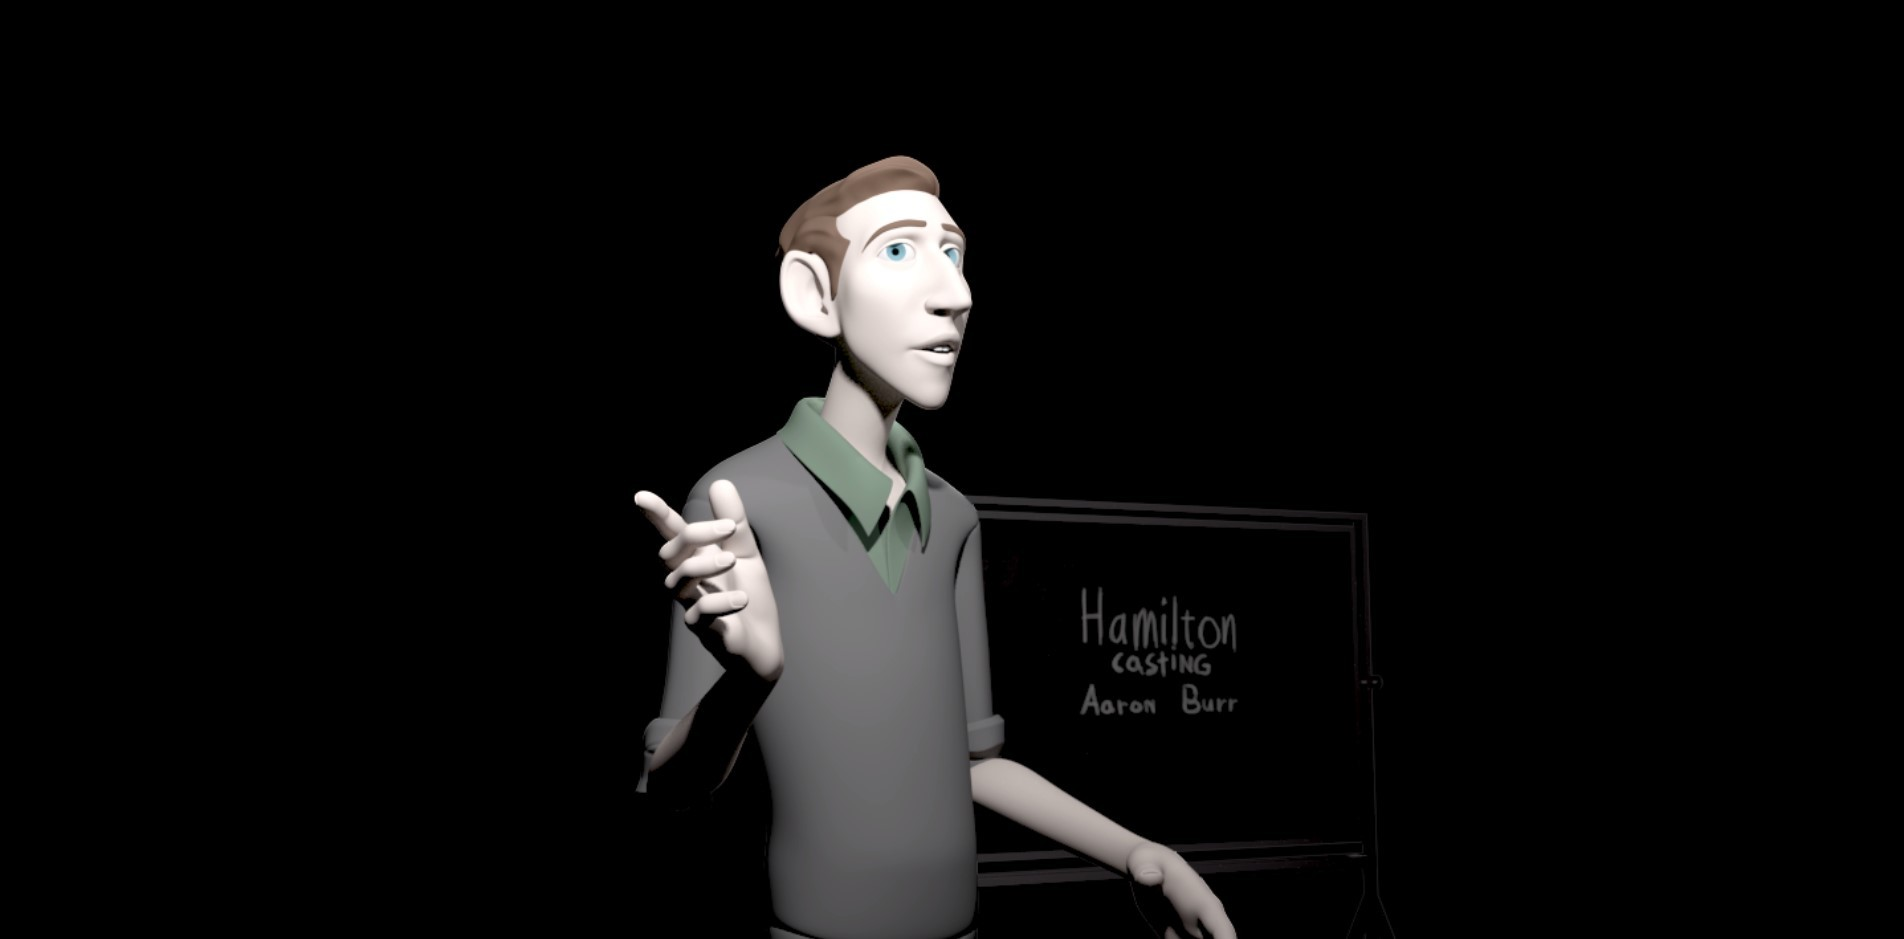 Hamilton animation